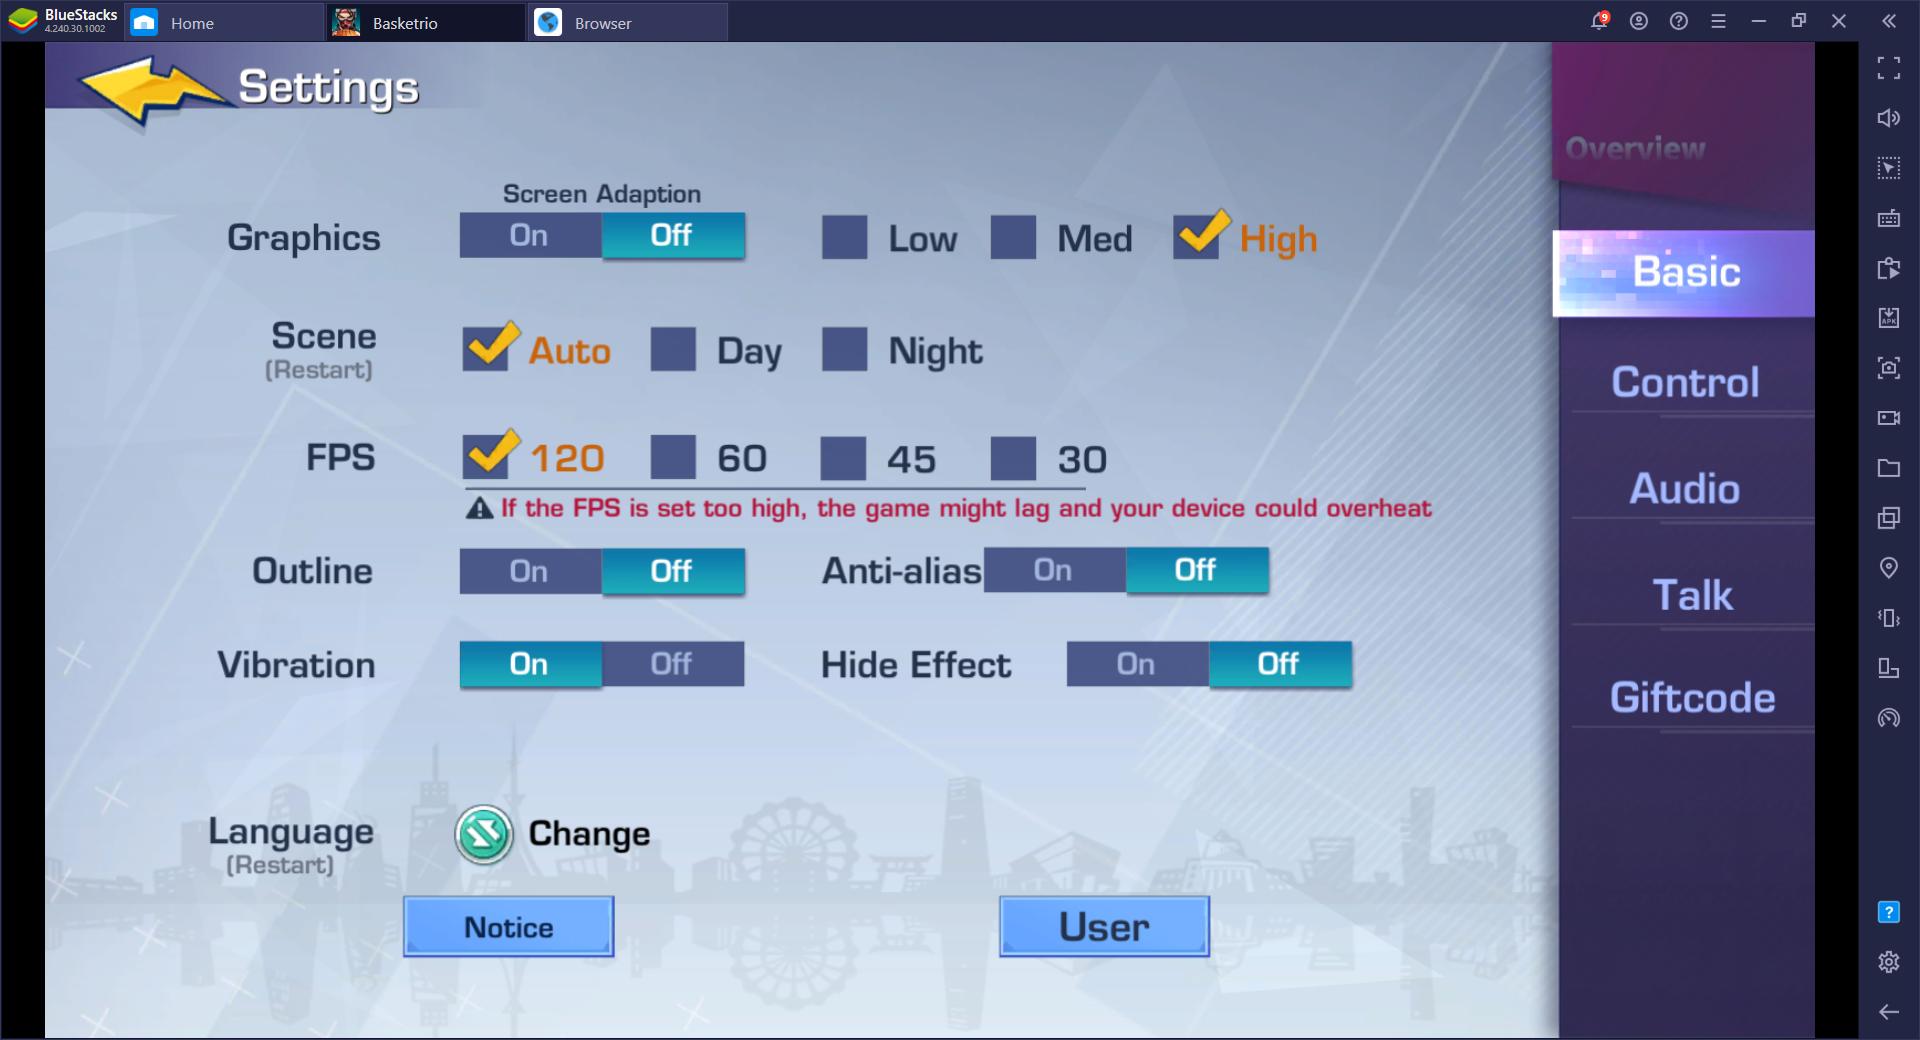 Basketrio di PC – Cara Menggunakan BlueStacks di PC atau Mac dan Memenangkan Setiap Pertandingan